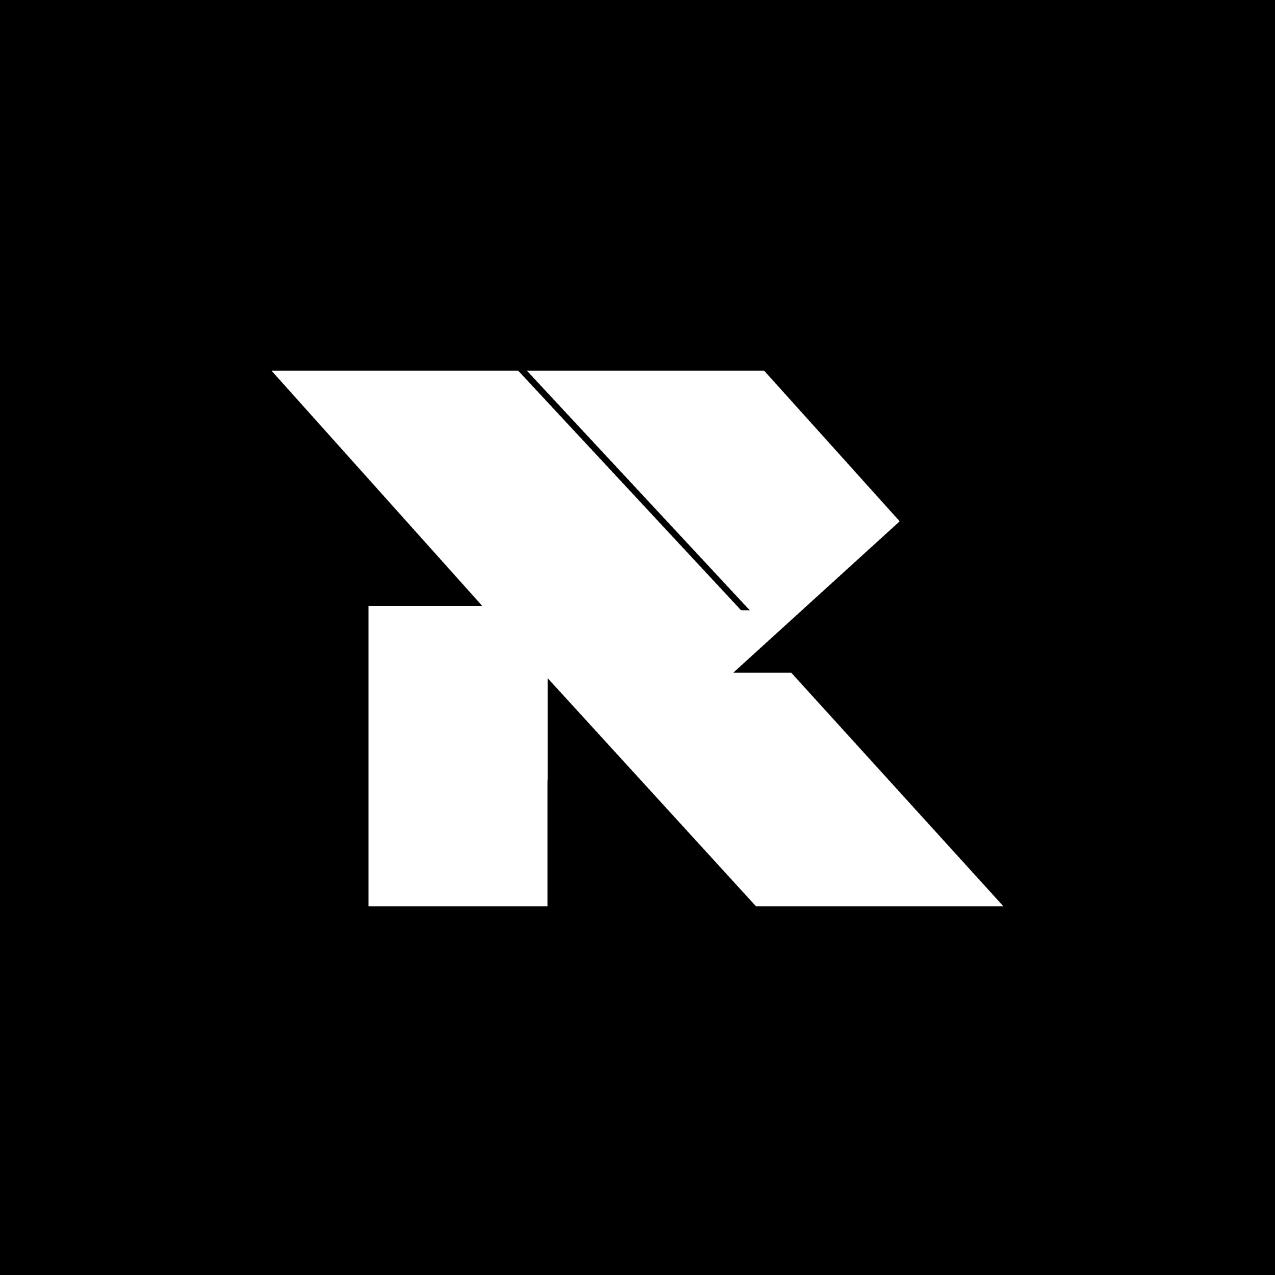 Letter R6 Design by Furia